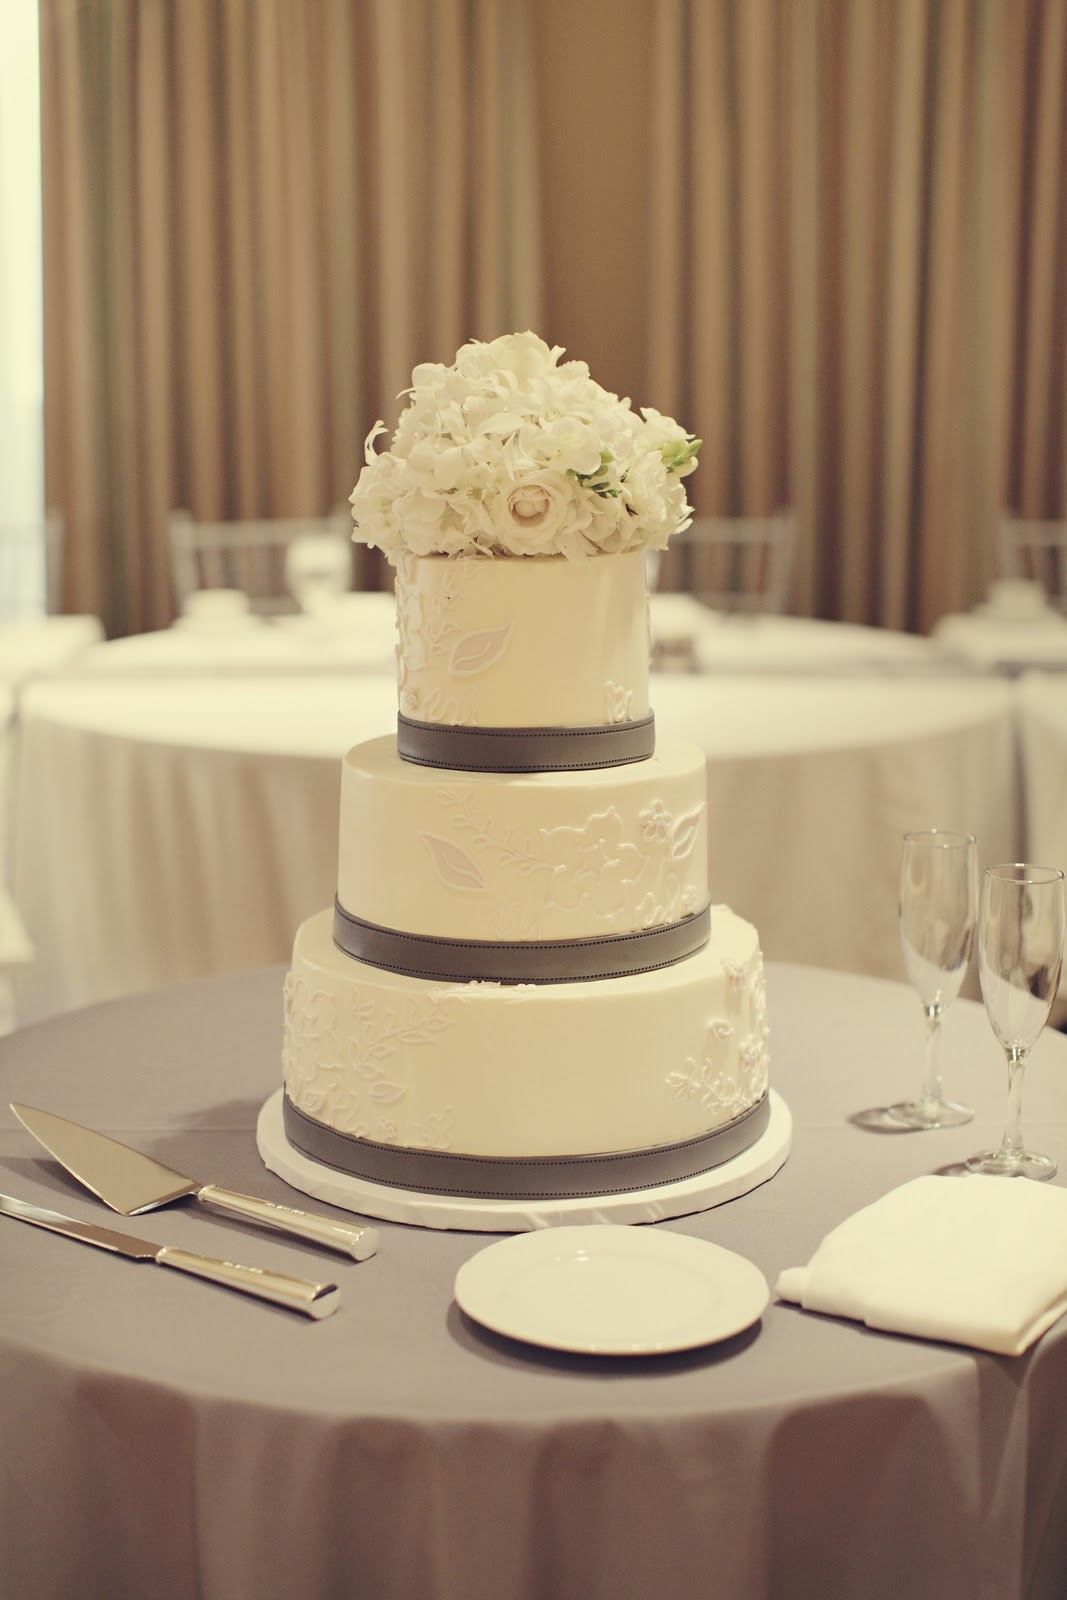 Tidbits on Weddings by Destination Planner & Designer Kelly ...